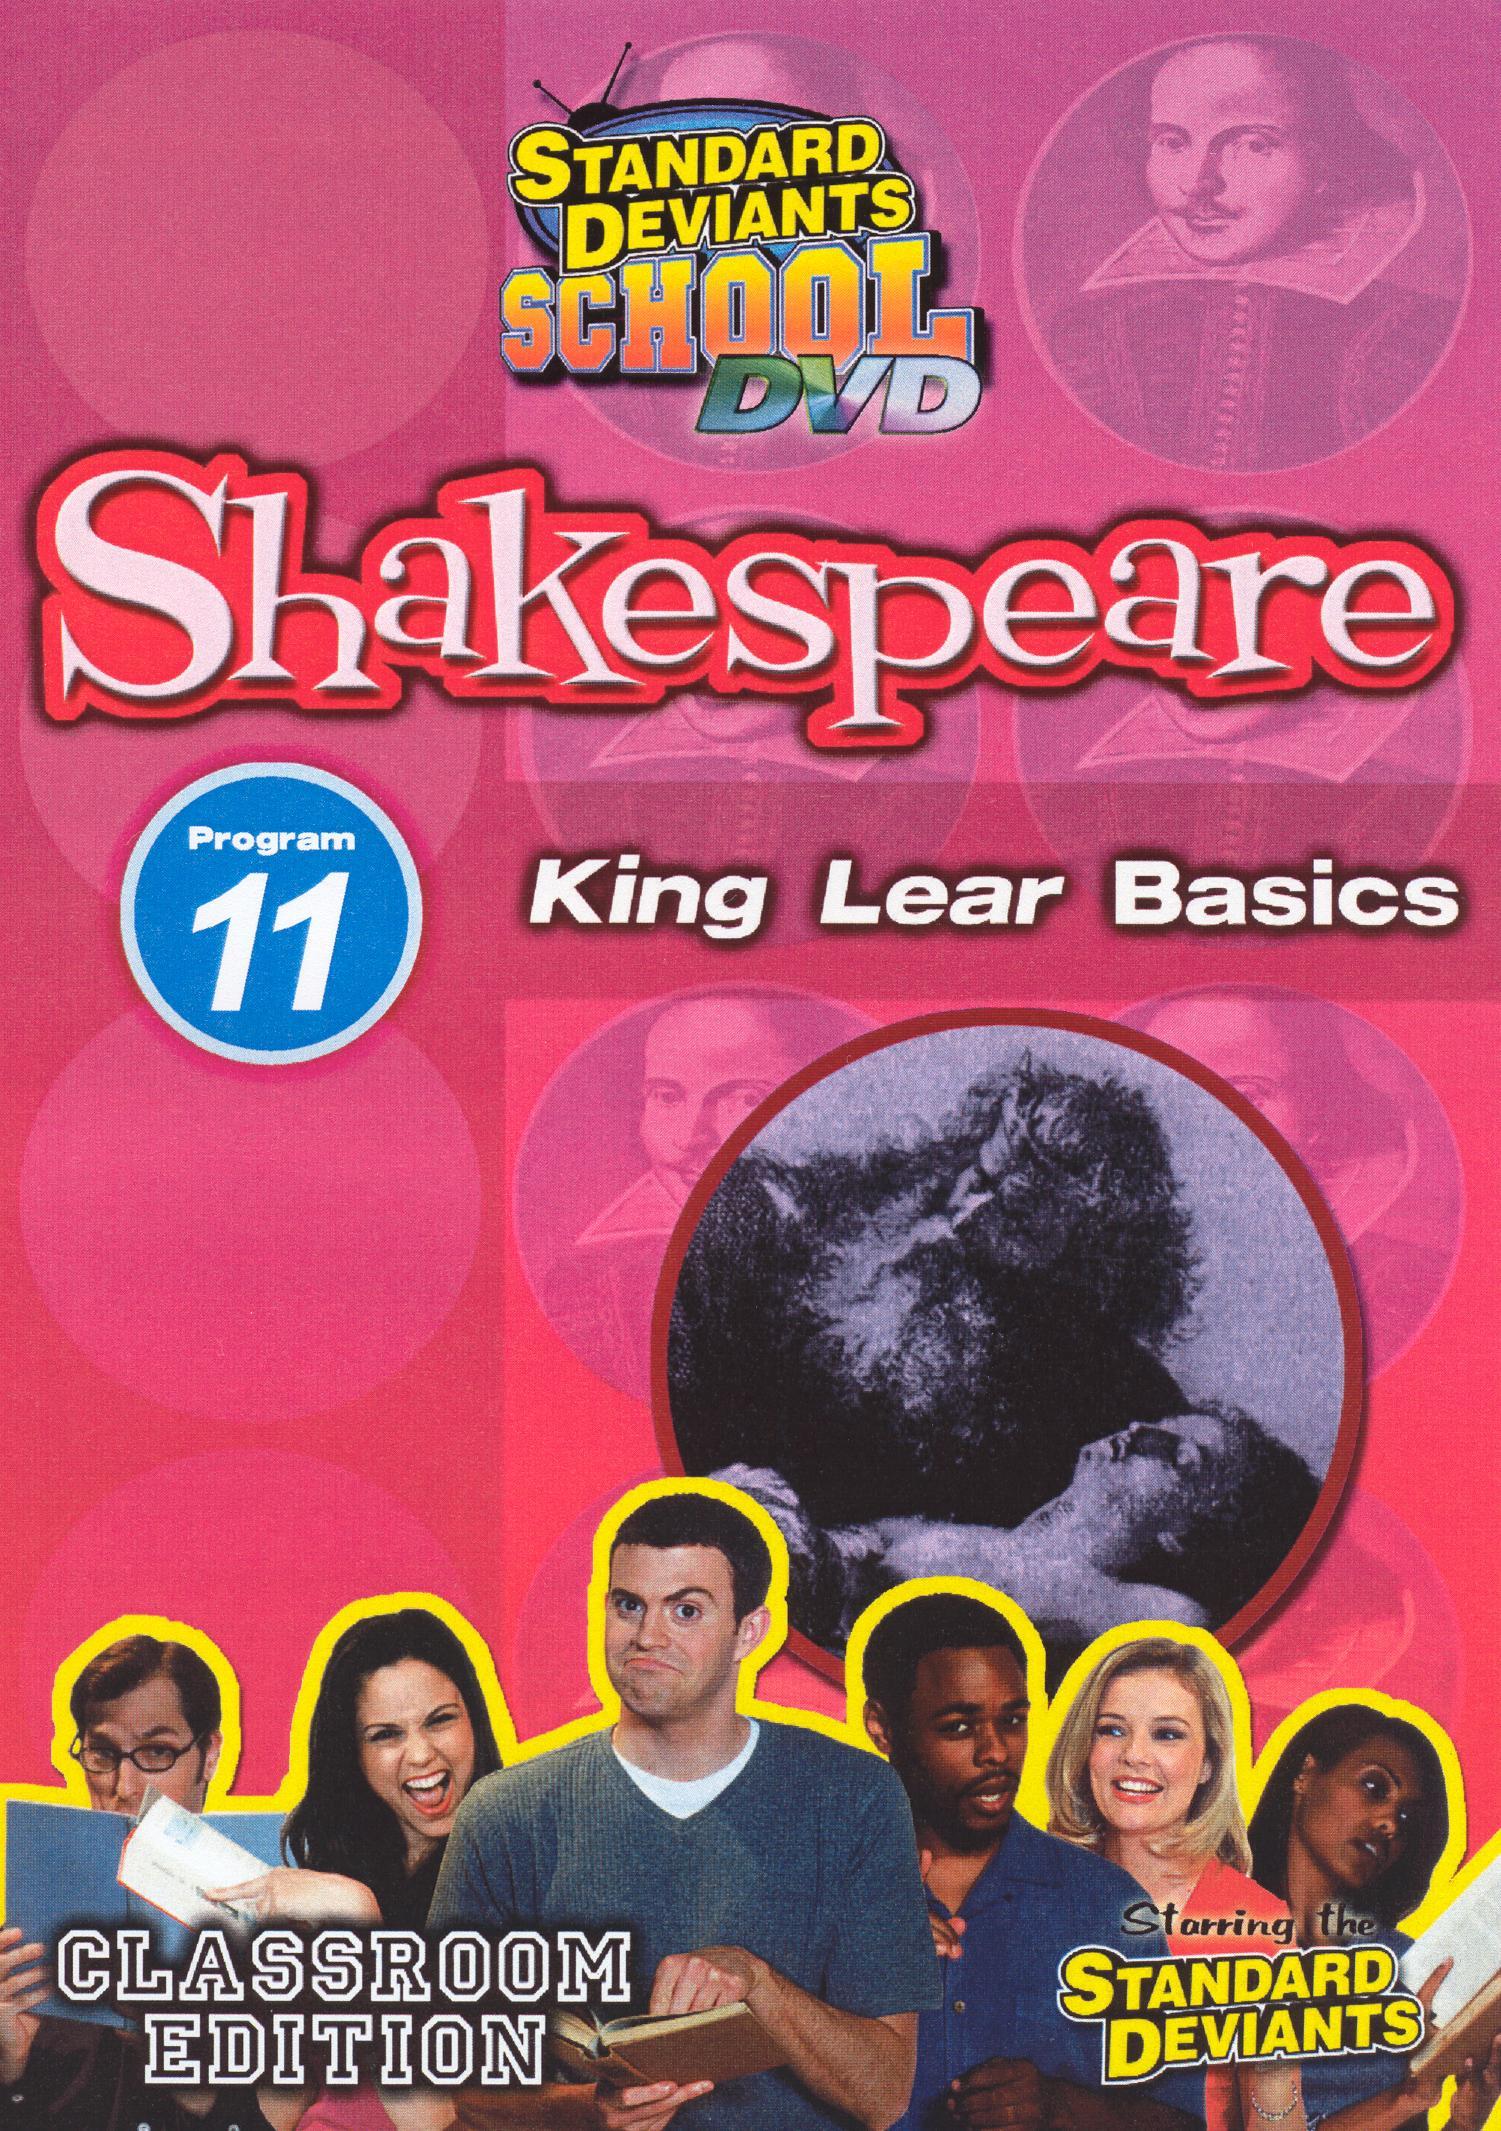 Standard Deviants School: Shakespeare, Program 11 - King Lear Basics